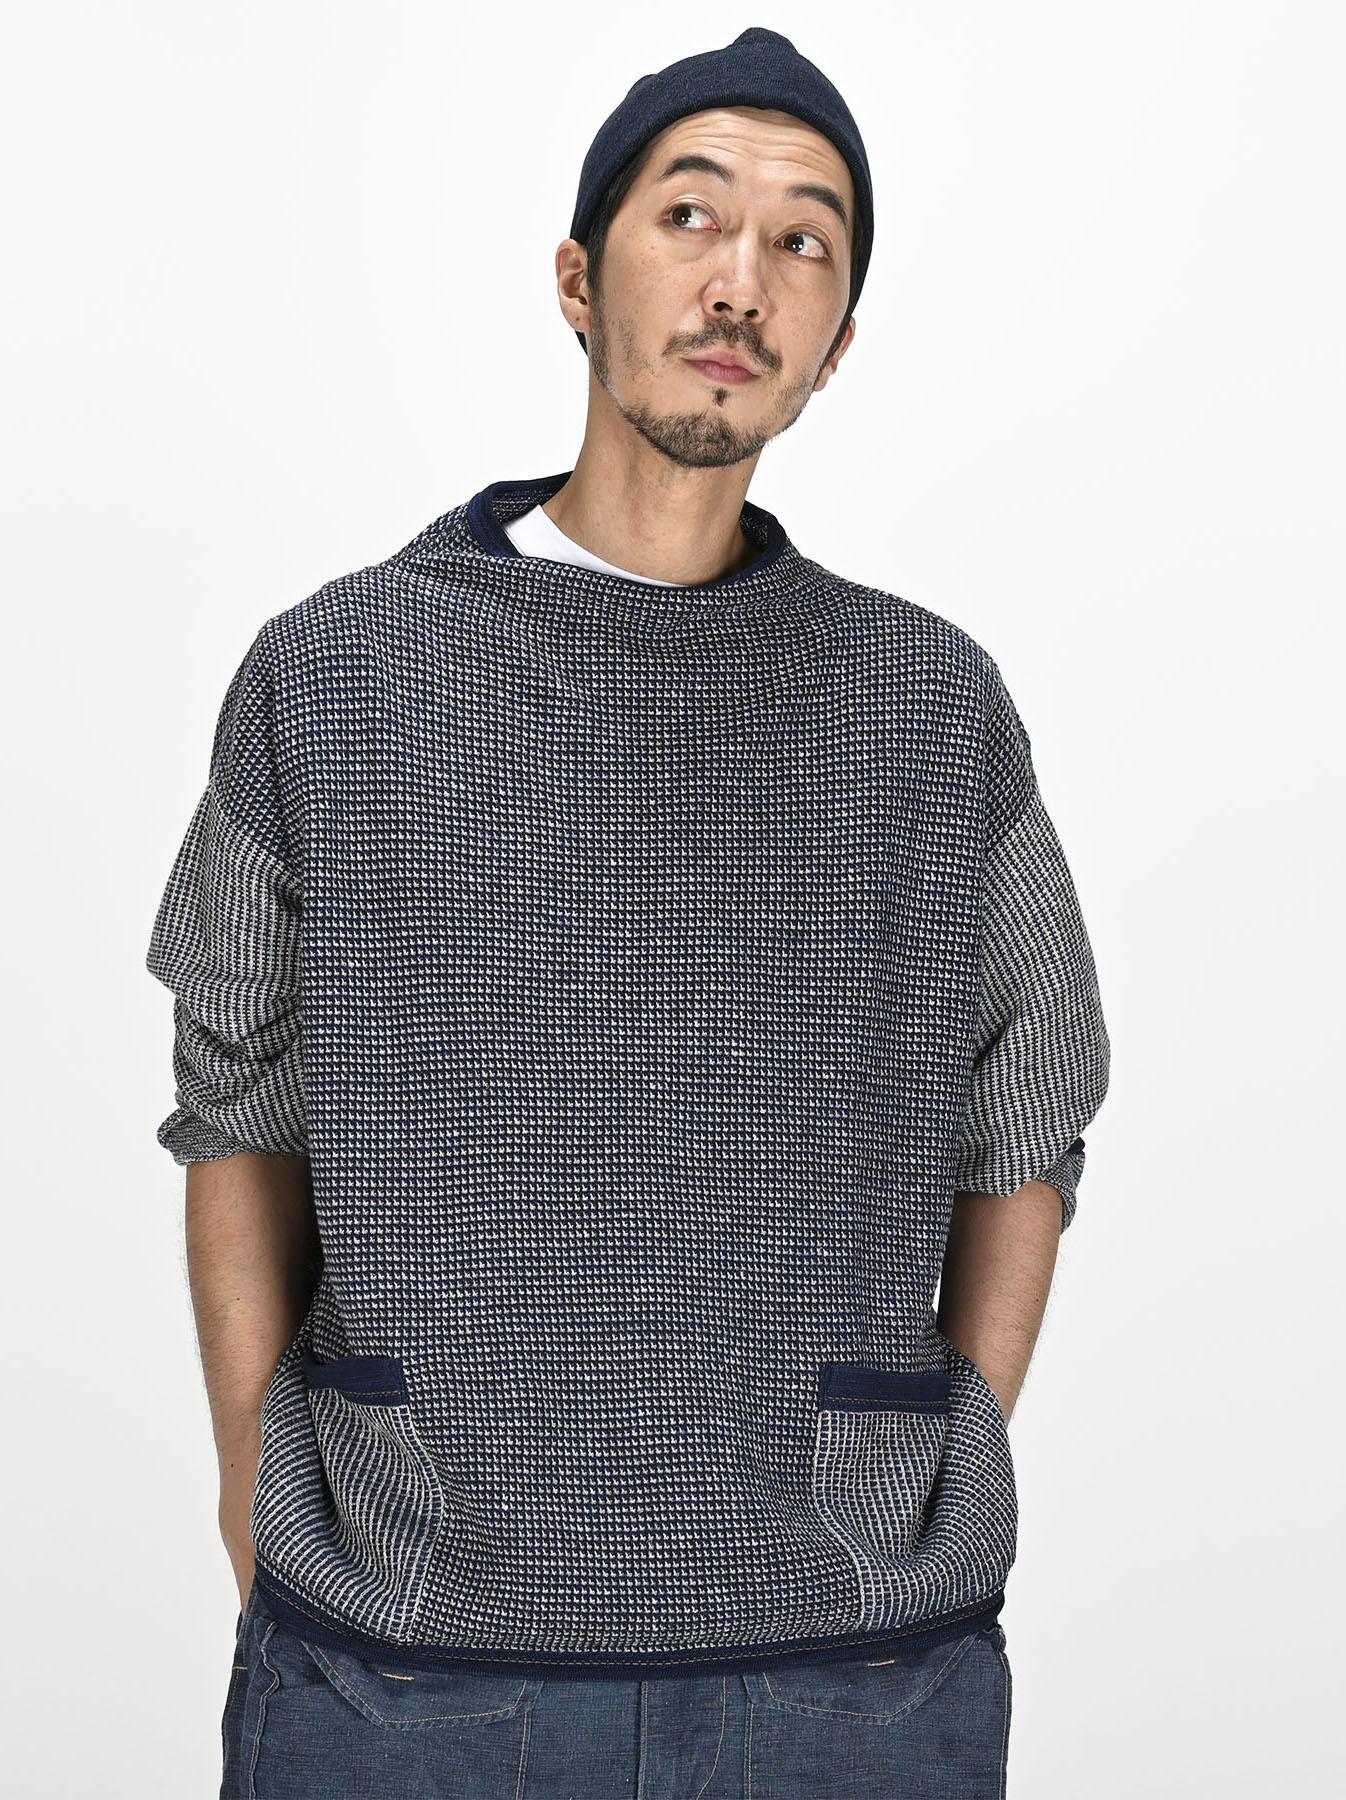 Indigo Tappet Kanoko Umahiko Sweater-6